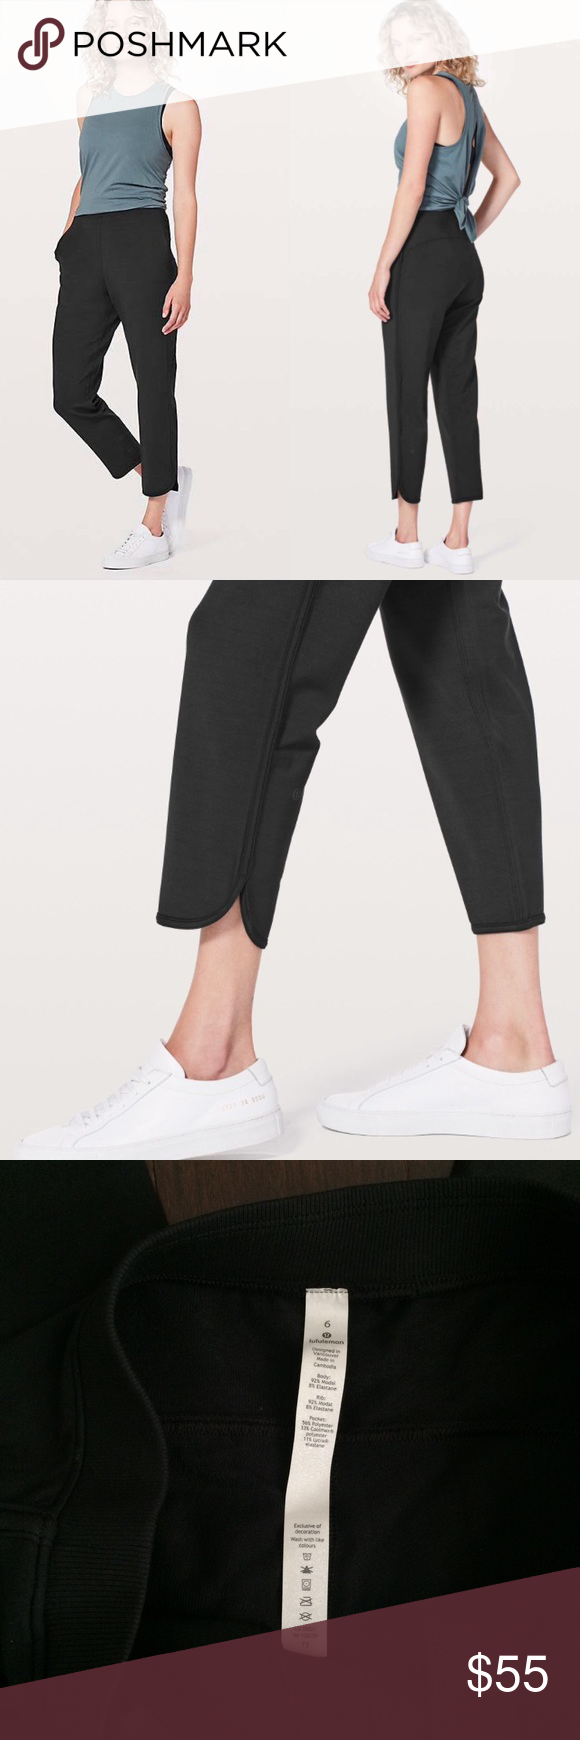 20b16fdcf Lululemon Every Moment Pants Size 6 Brand new with tags! lululemon  athletica Pants